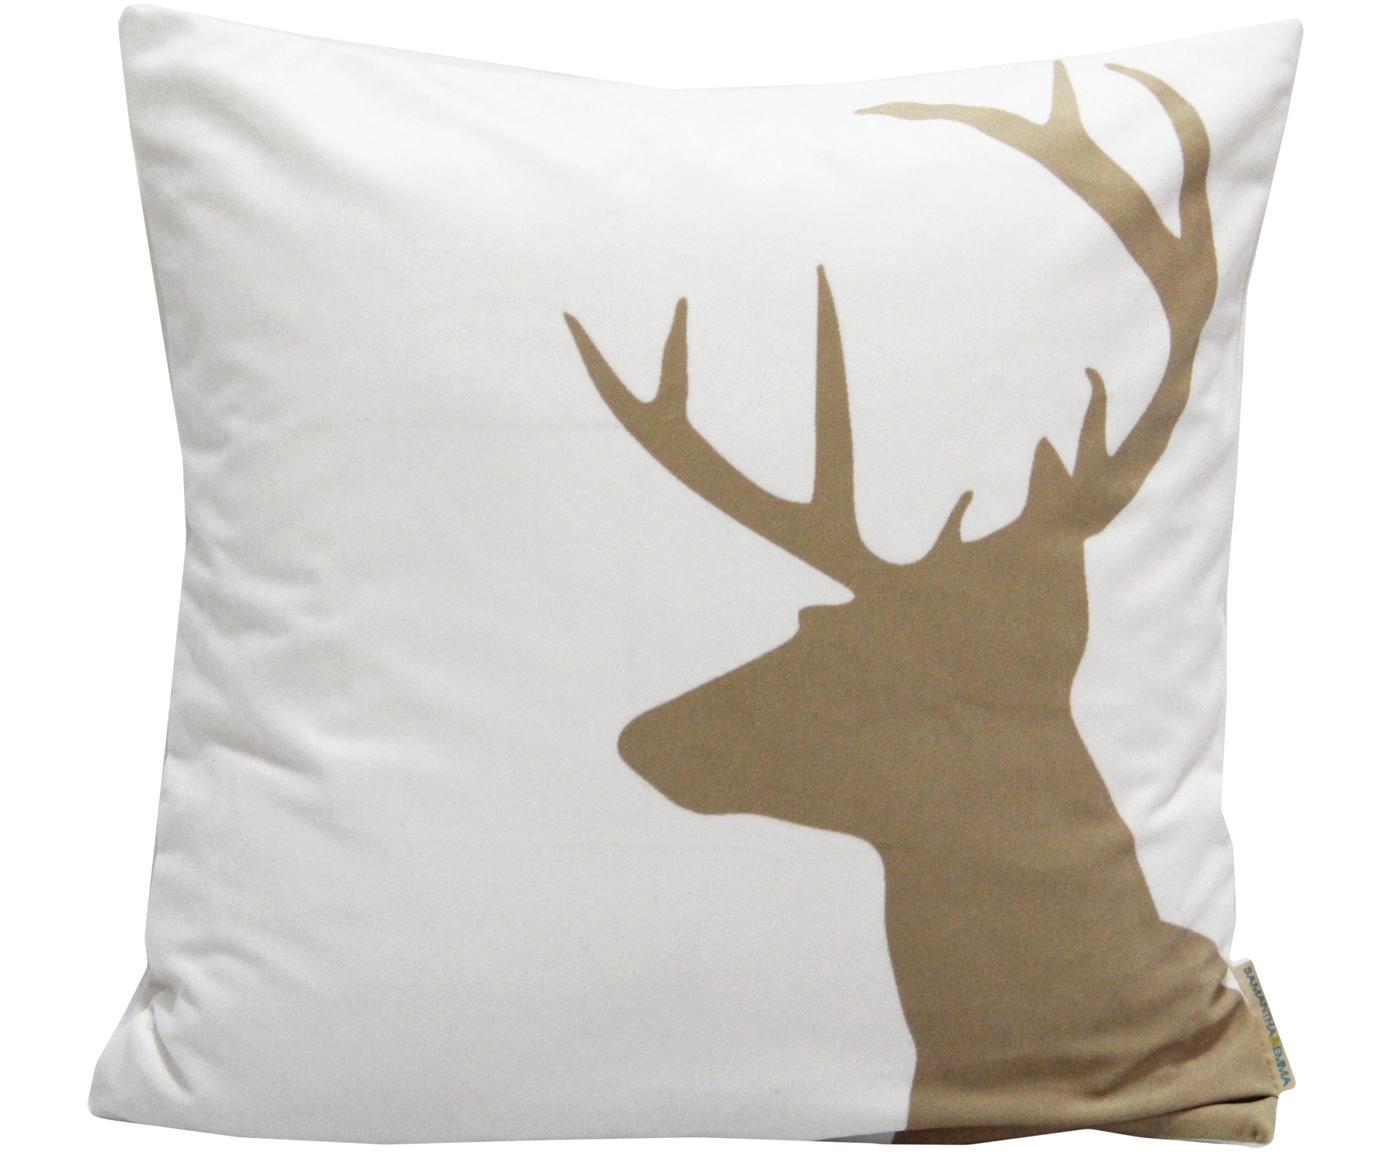 Samt-Kissenhülle Reindeer, Polyestersamt, Weiß, Braun, 45 x 45 cm